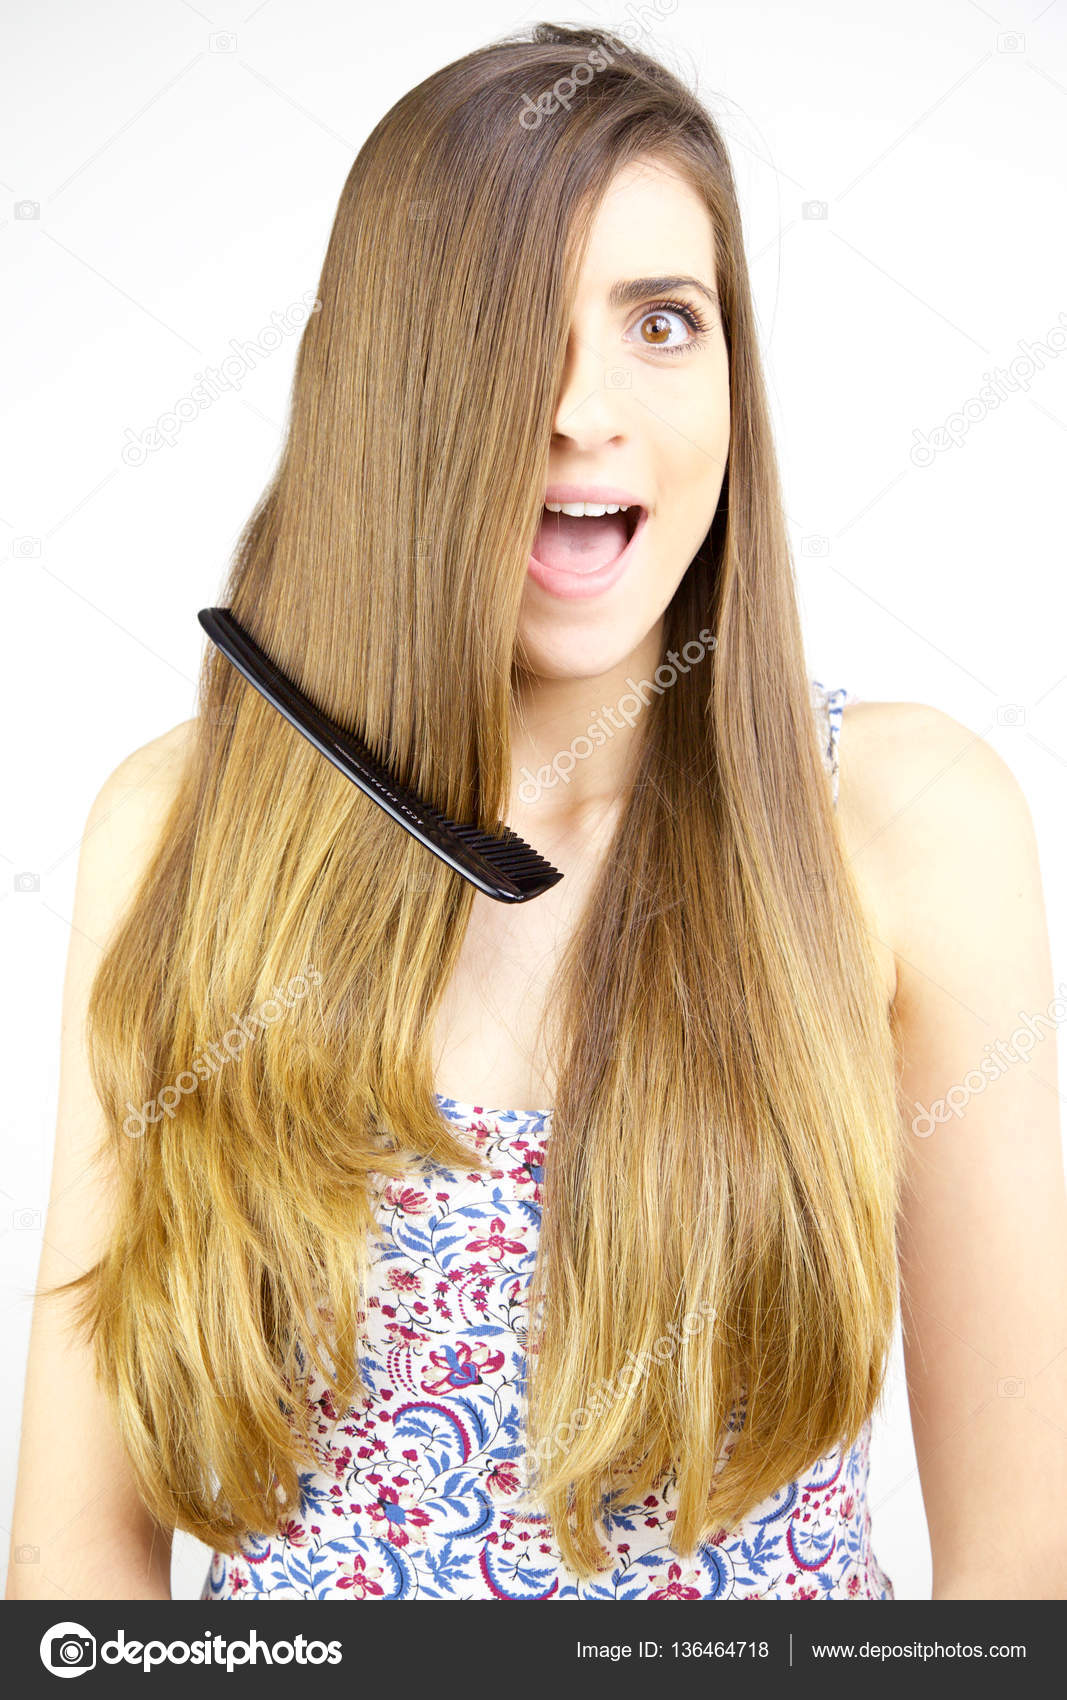 Beautiful Woman With Tangled Hair Surprised Medium Shot Stock Photo C Fedemarsicano 136464718